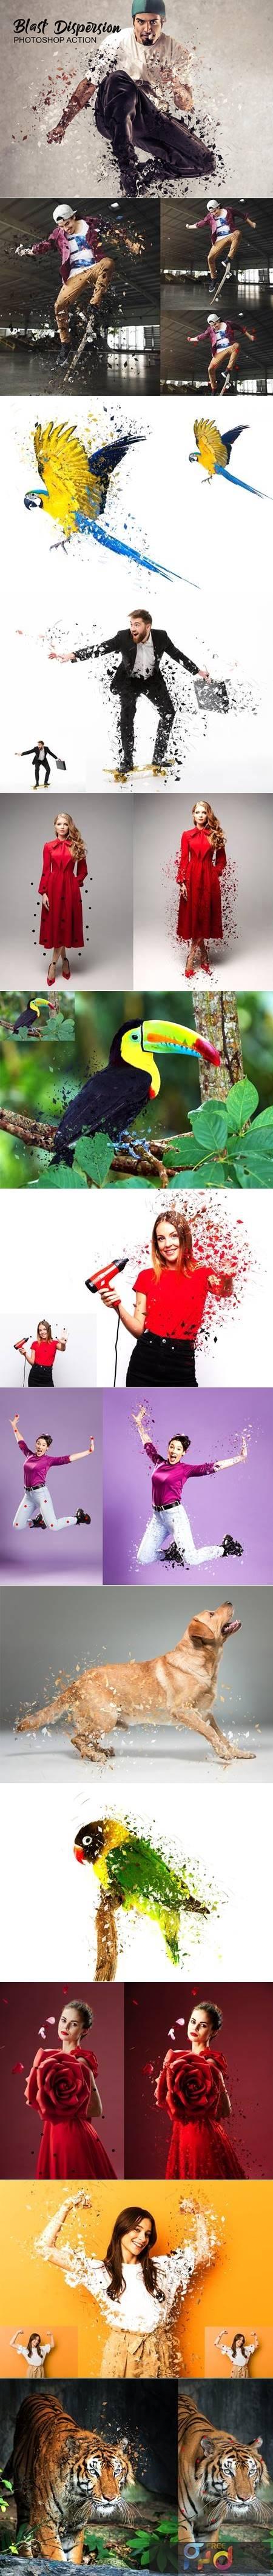 Blast Dispersion Photoshop Action 4755670 1